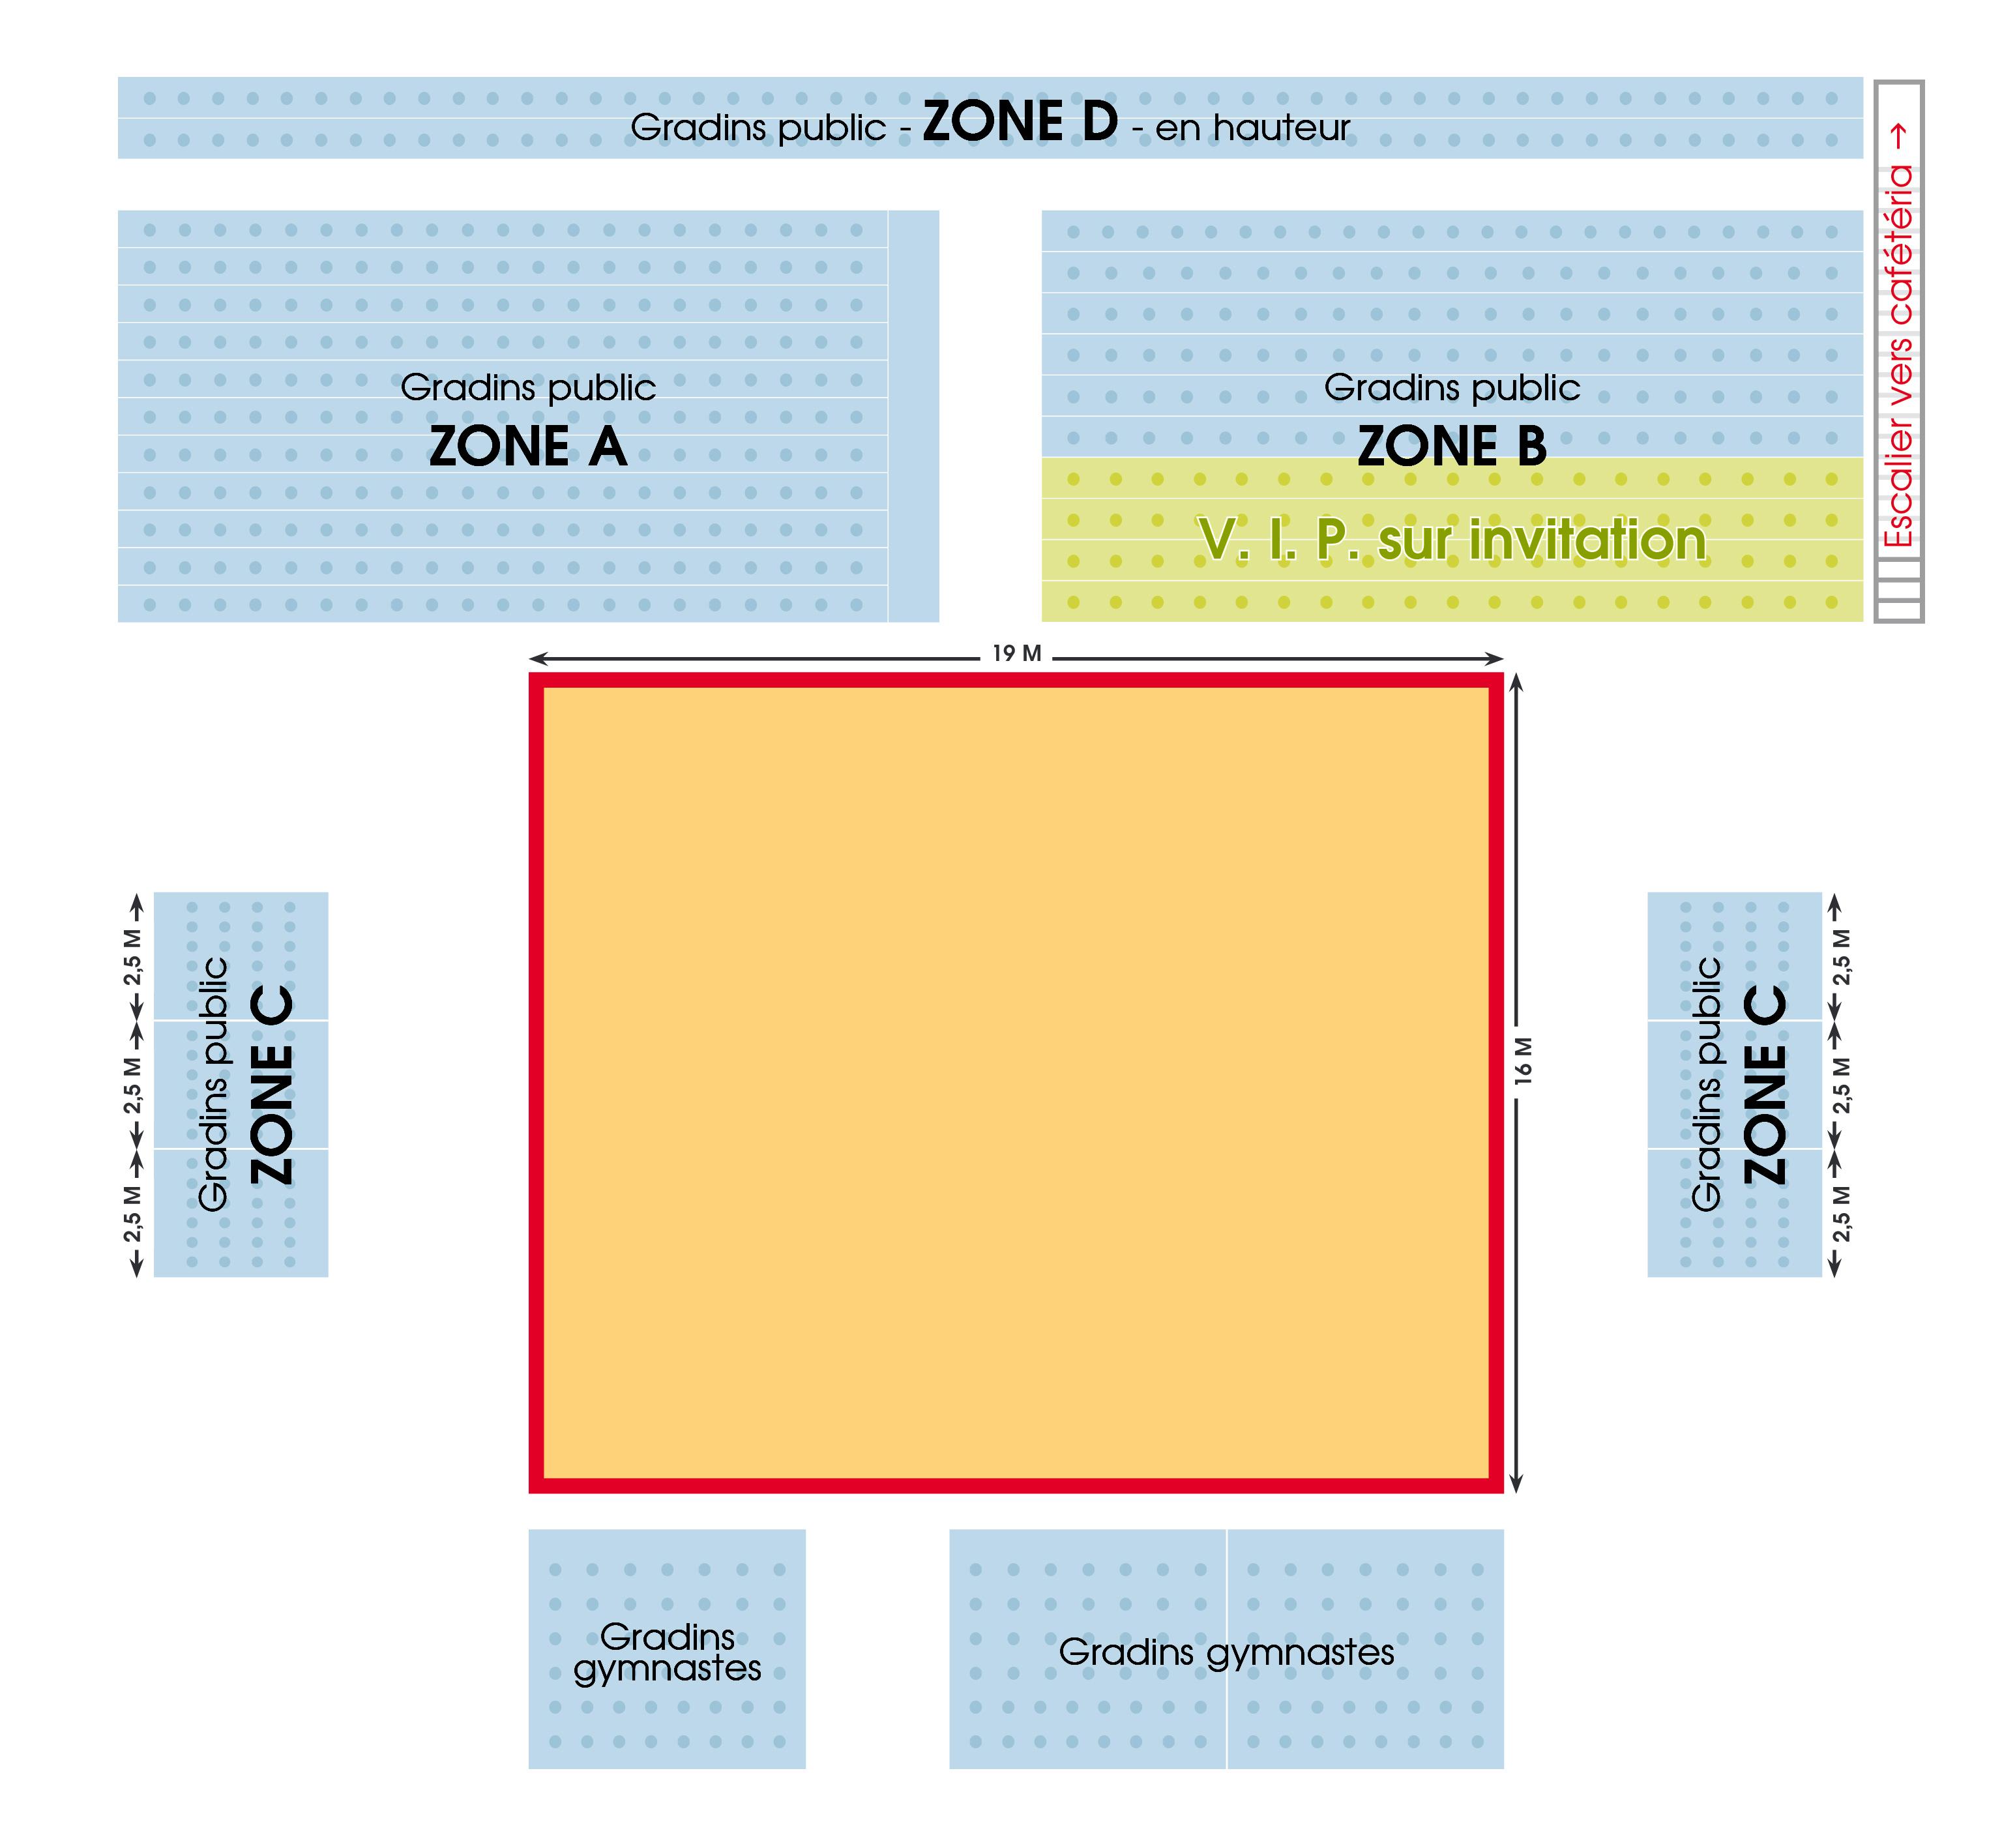 Gala-Eurogym-Plan-hall-Omnisport-Huy-corrige foncé